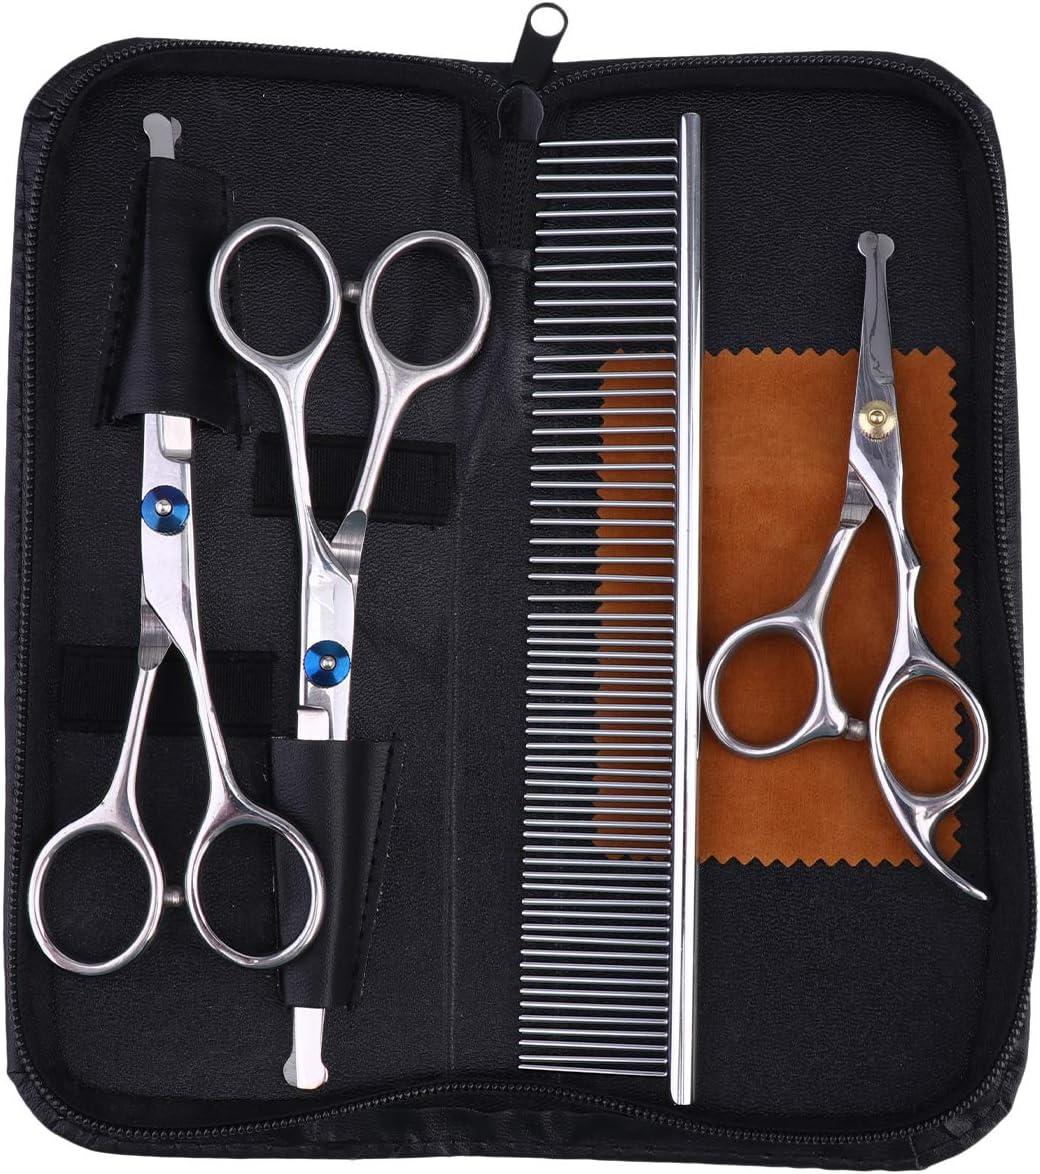 TEHAUX Dog Grooming Tool- Pet Kits Hair Scissors Genuine unisex Stainl